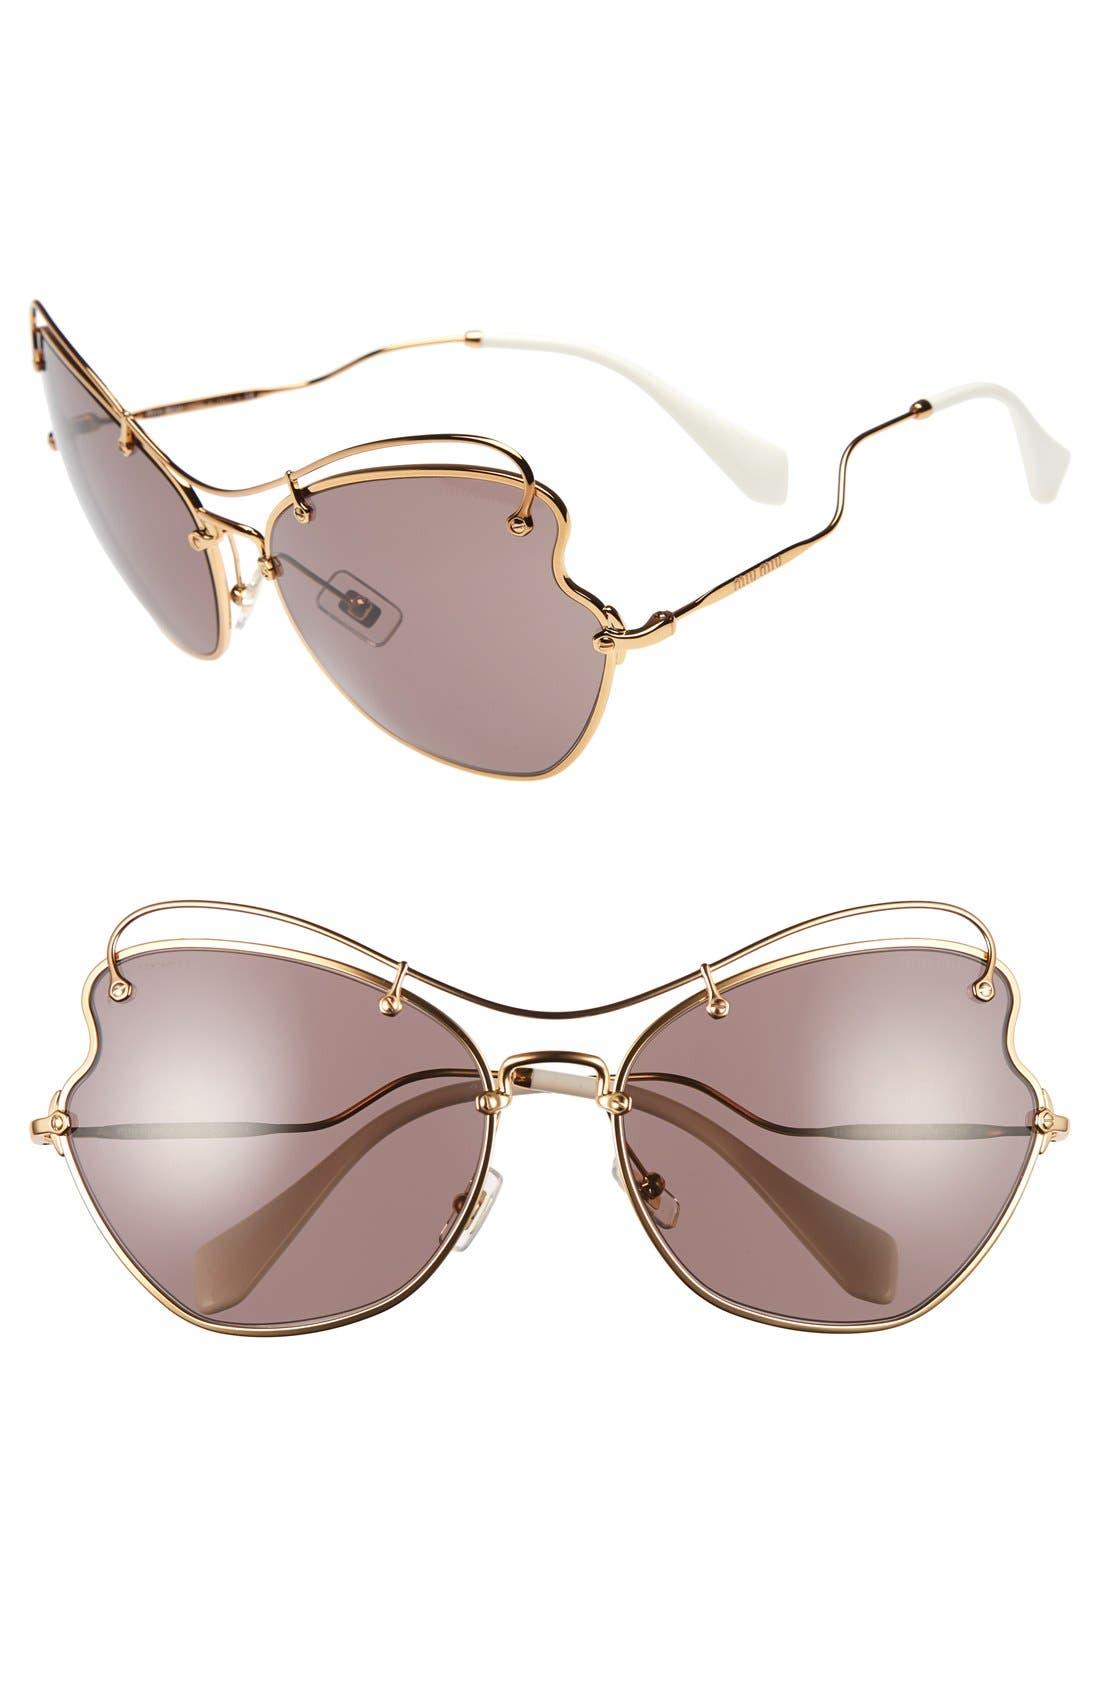 65mm Sunglasses,                         Main,                         color, Light Purple